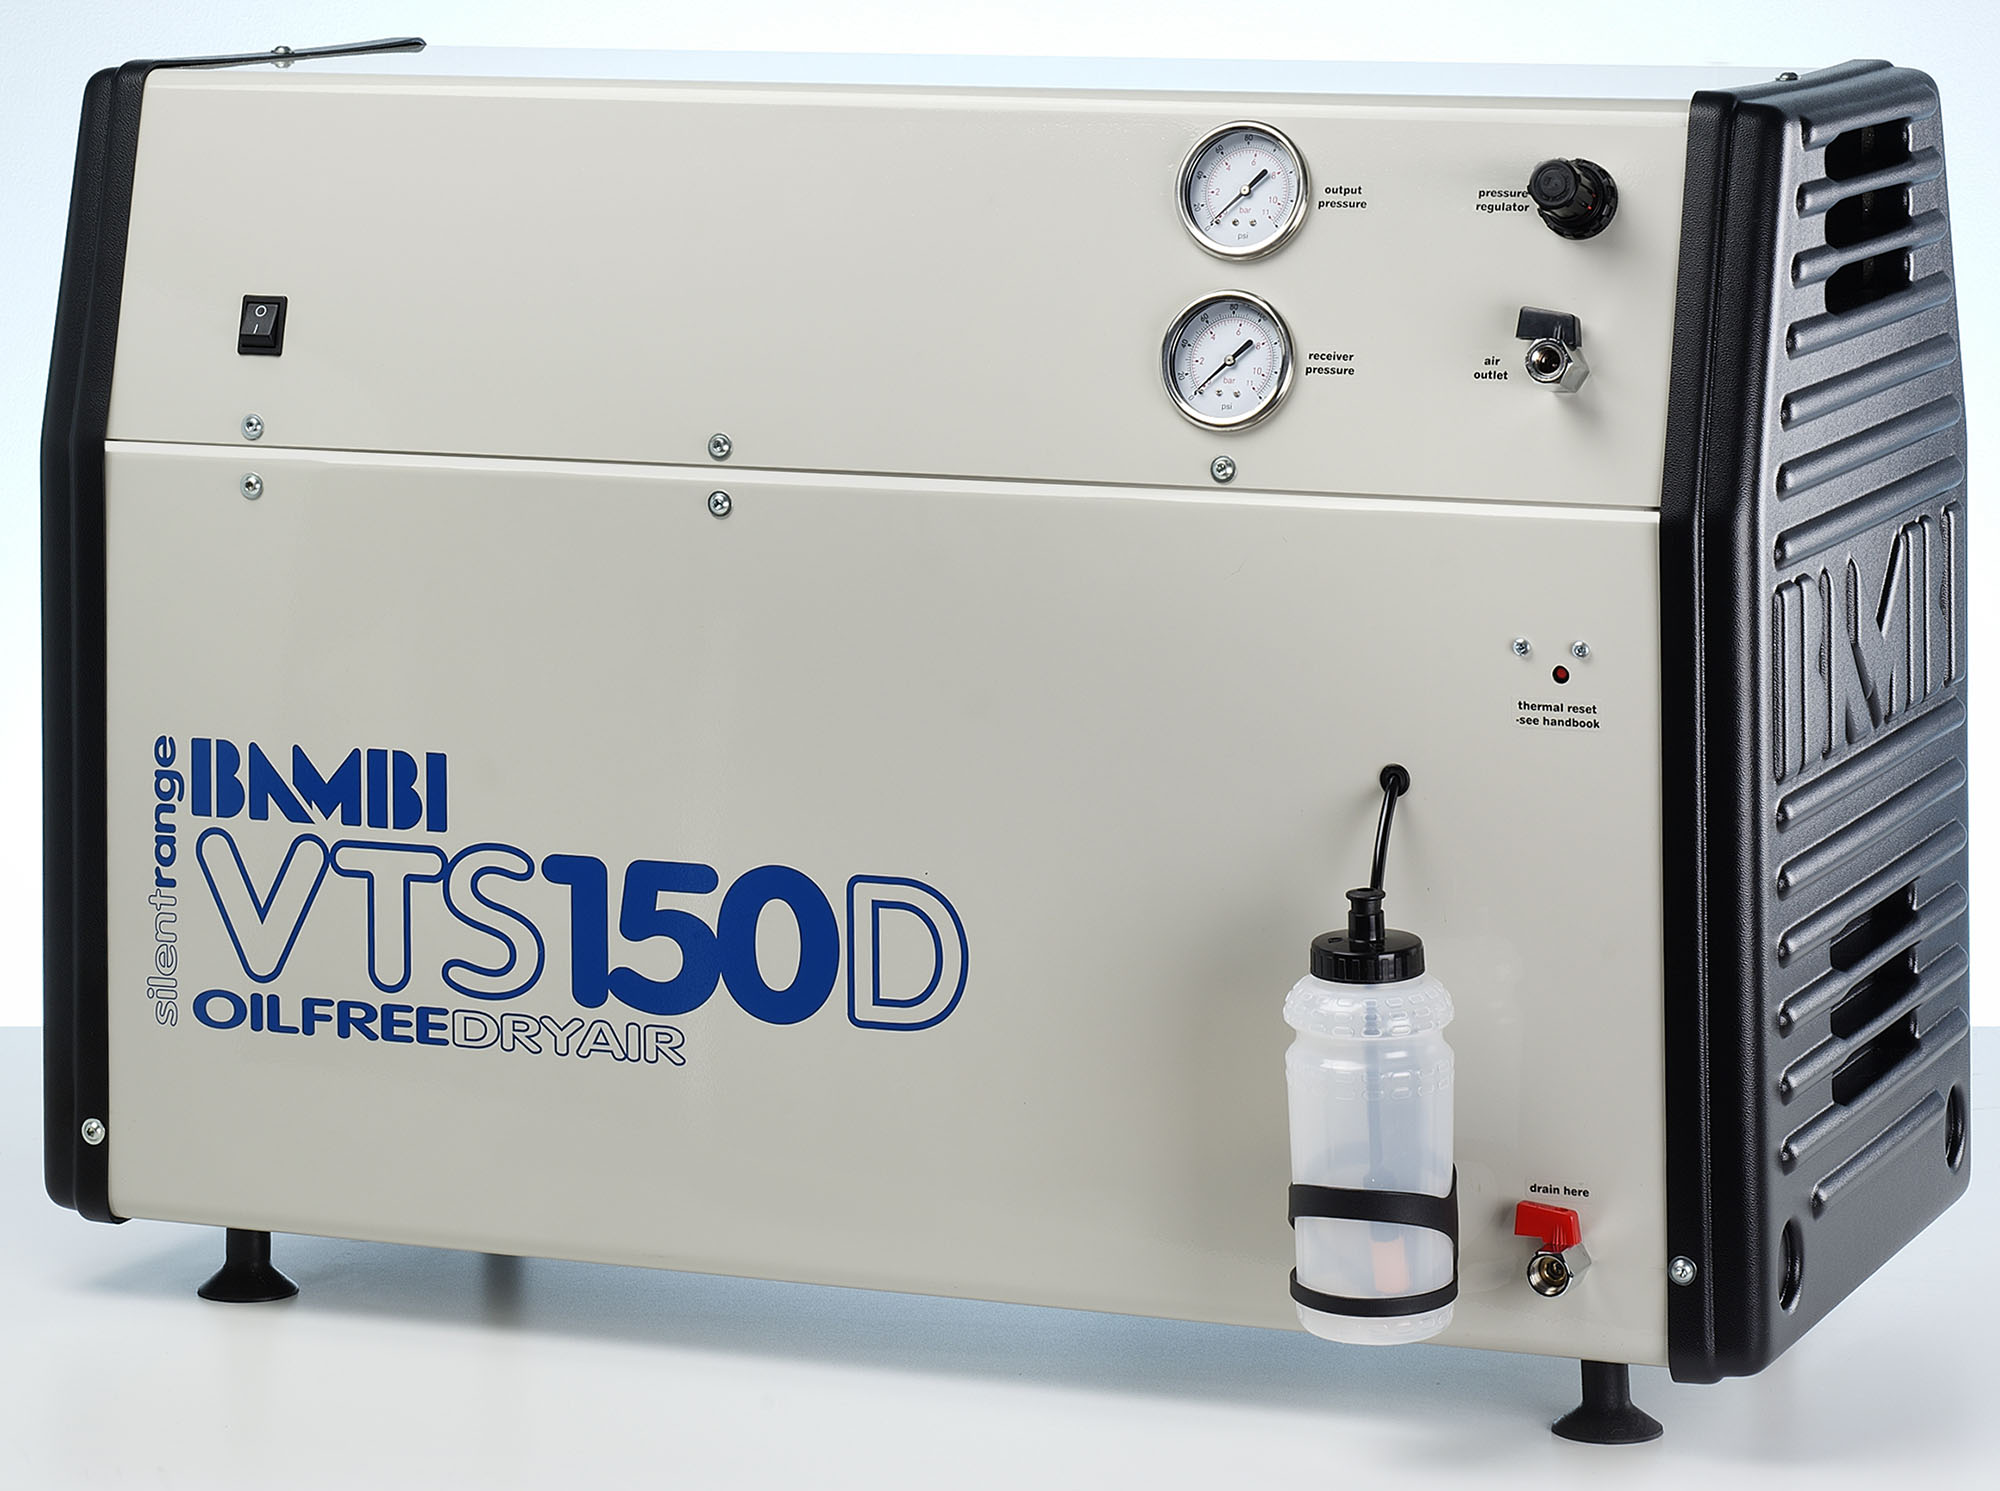 Midlands UK supplier of Bambi VTS150D air compressor